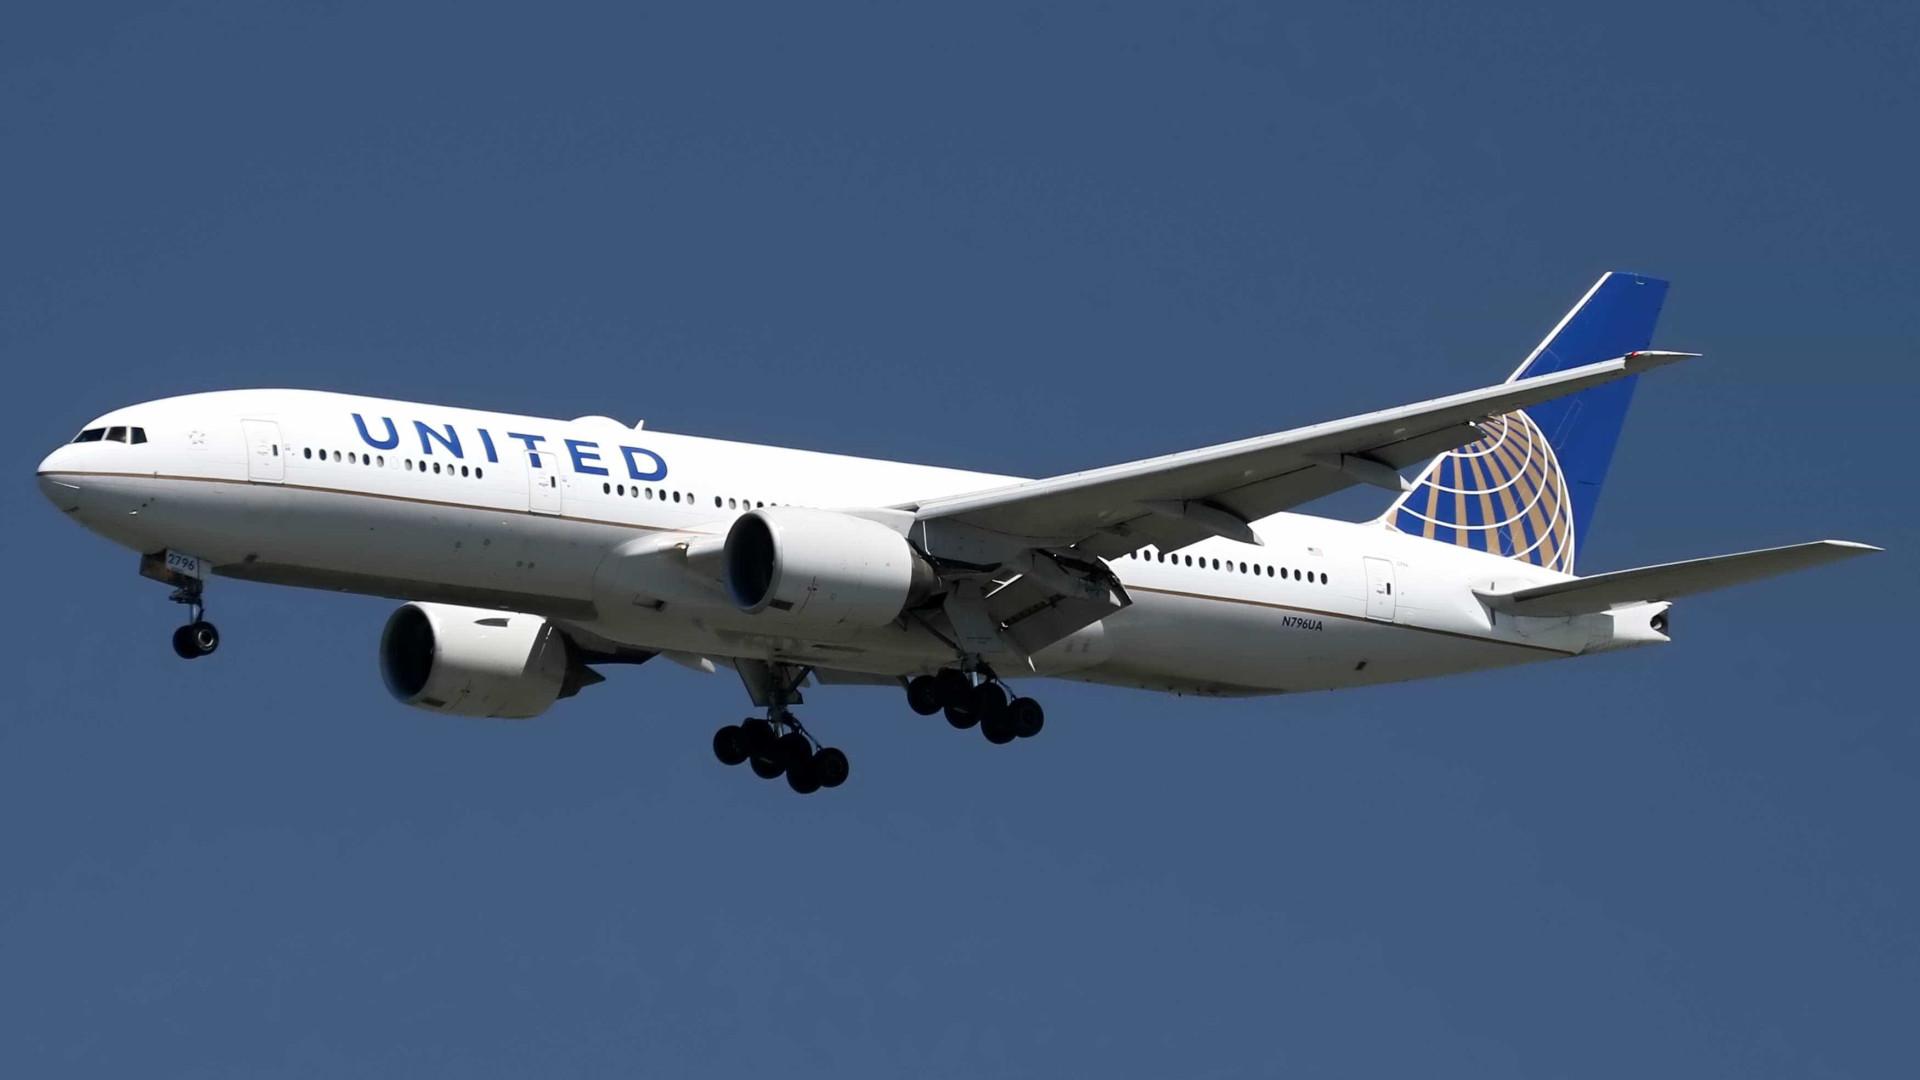 Motor de avião se desprende durante voo sobre o Pacífico